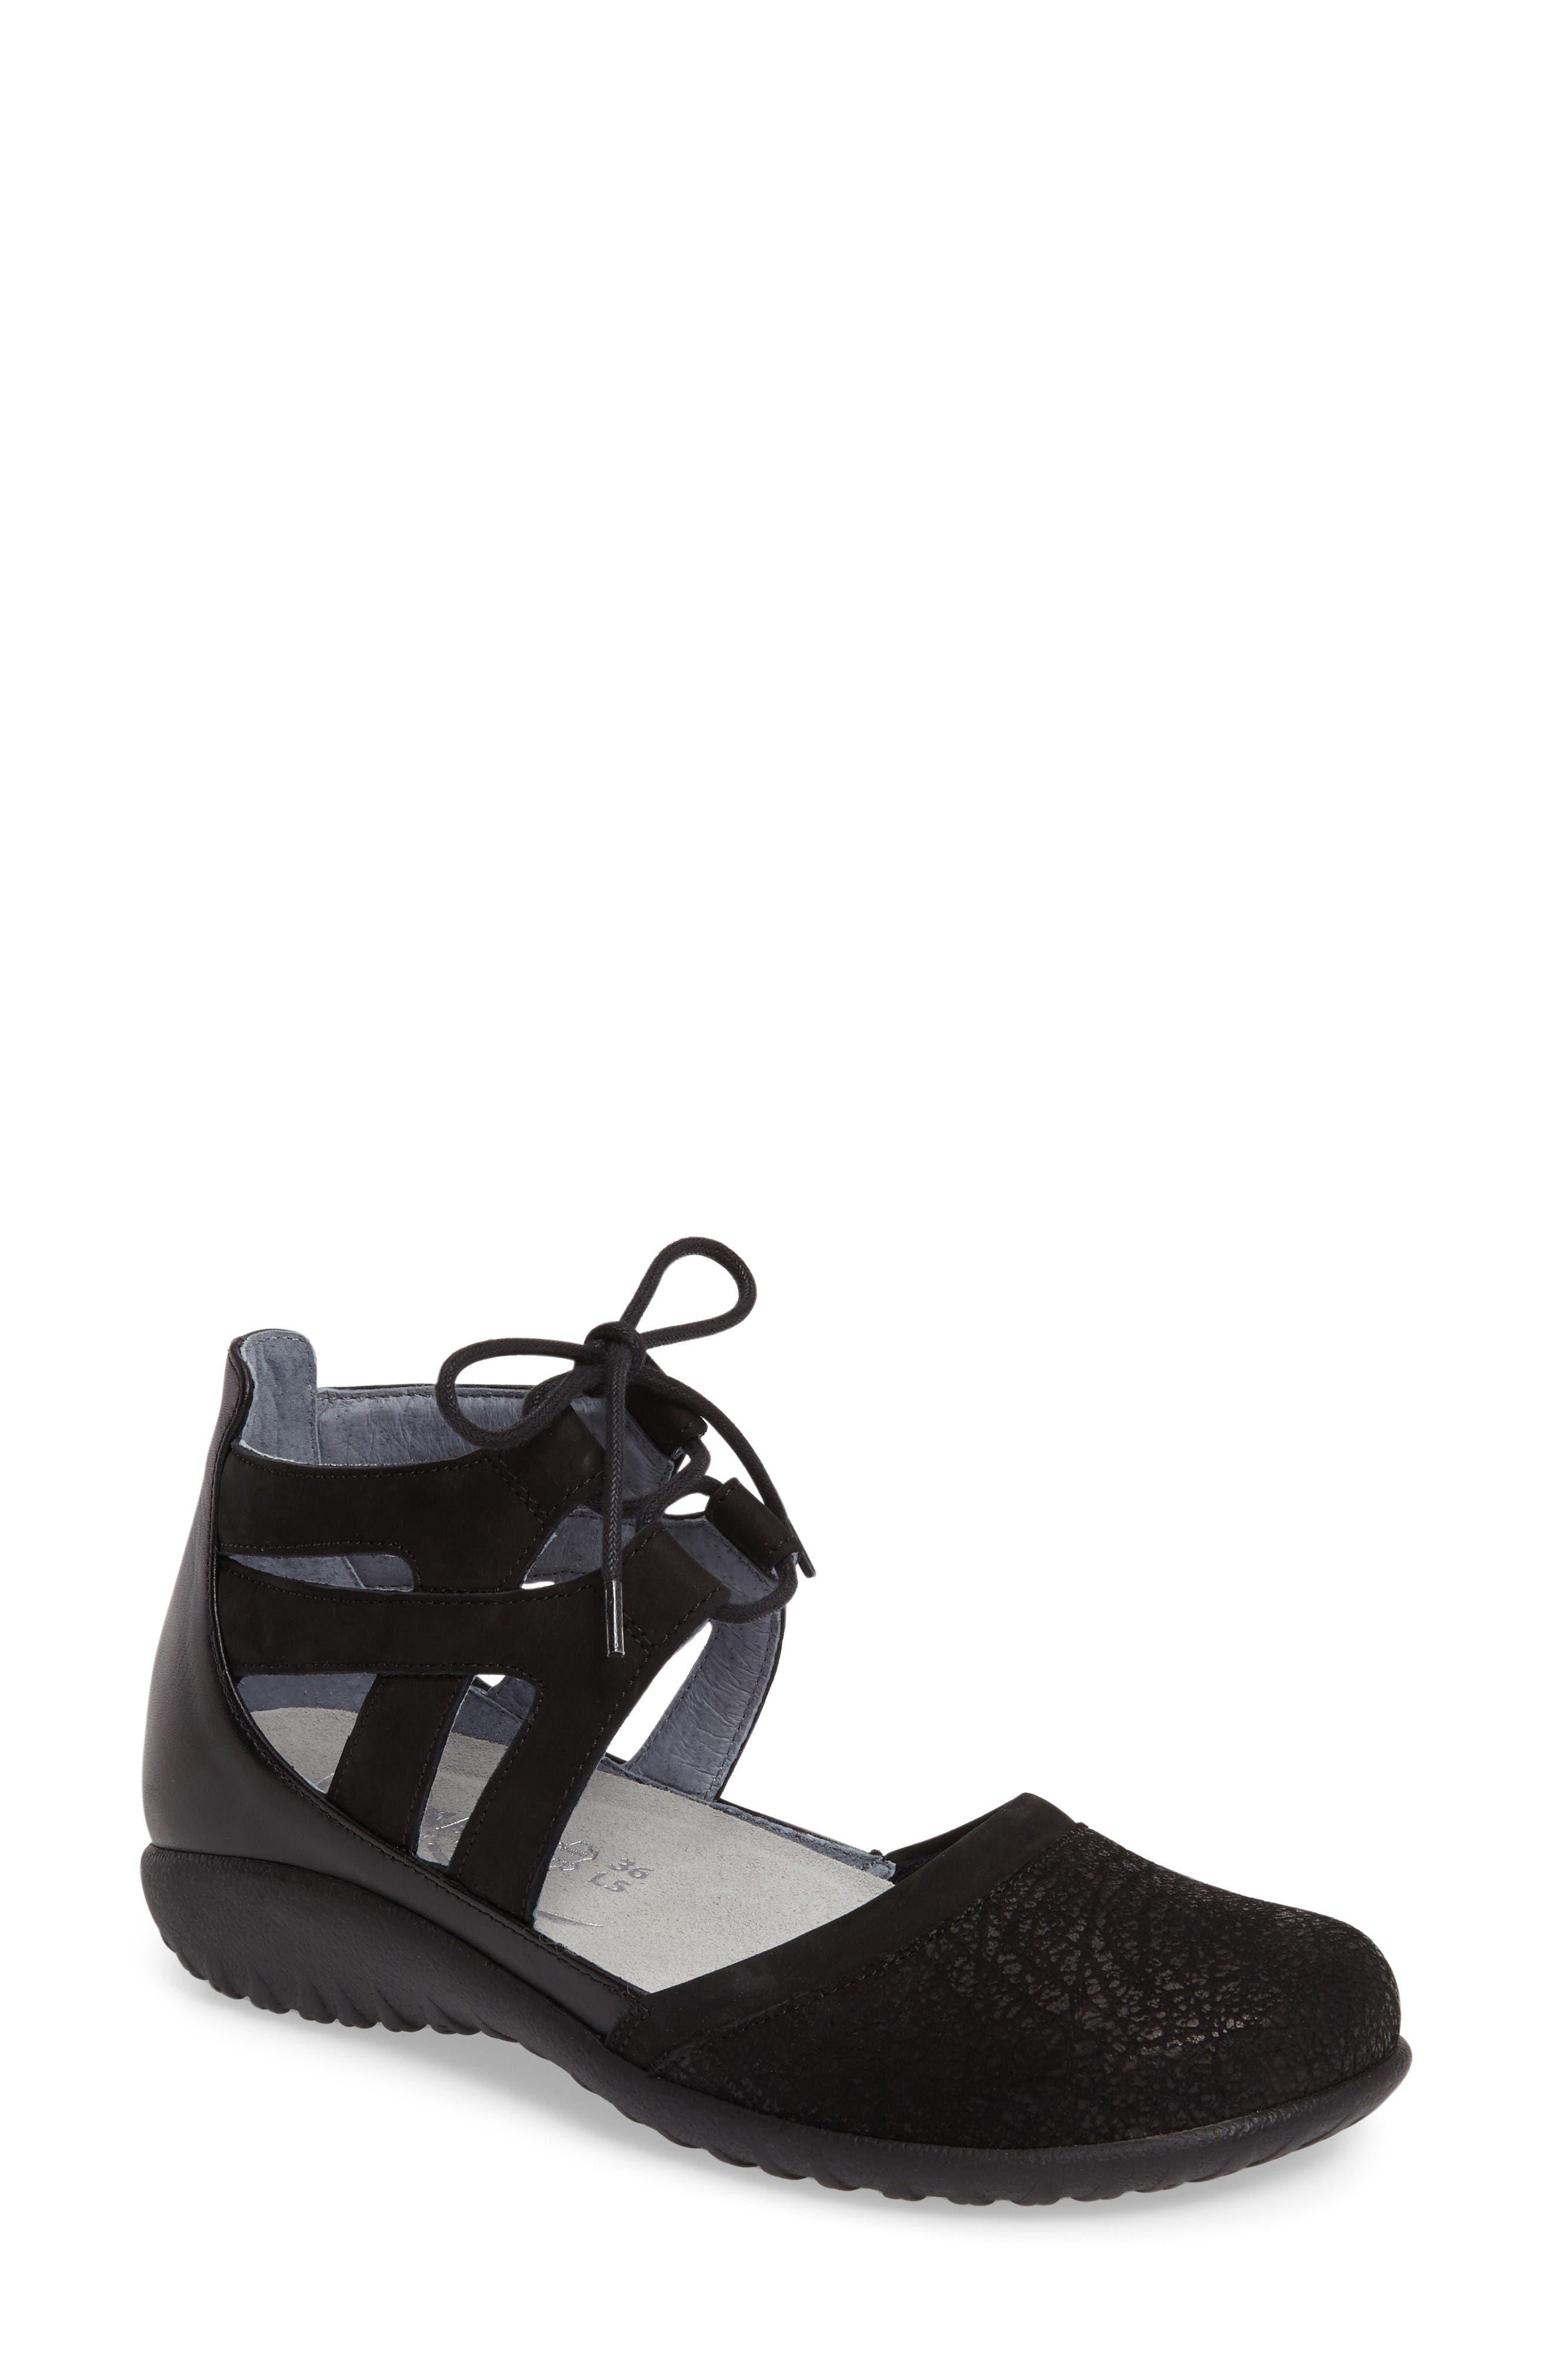 Main Image - Naot Kata Lace-Up Sandal (Women)